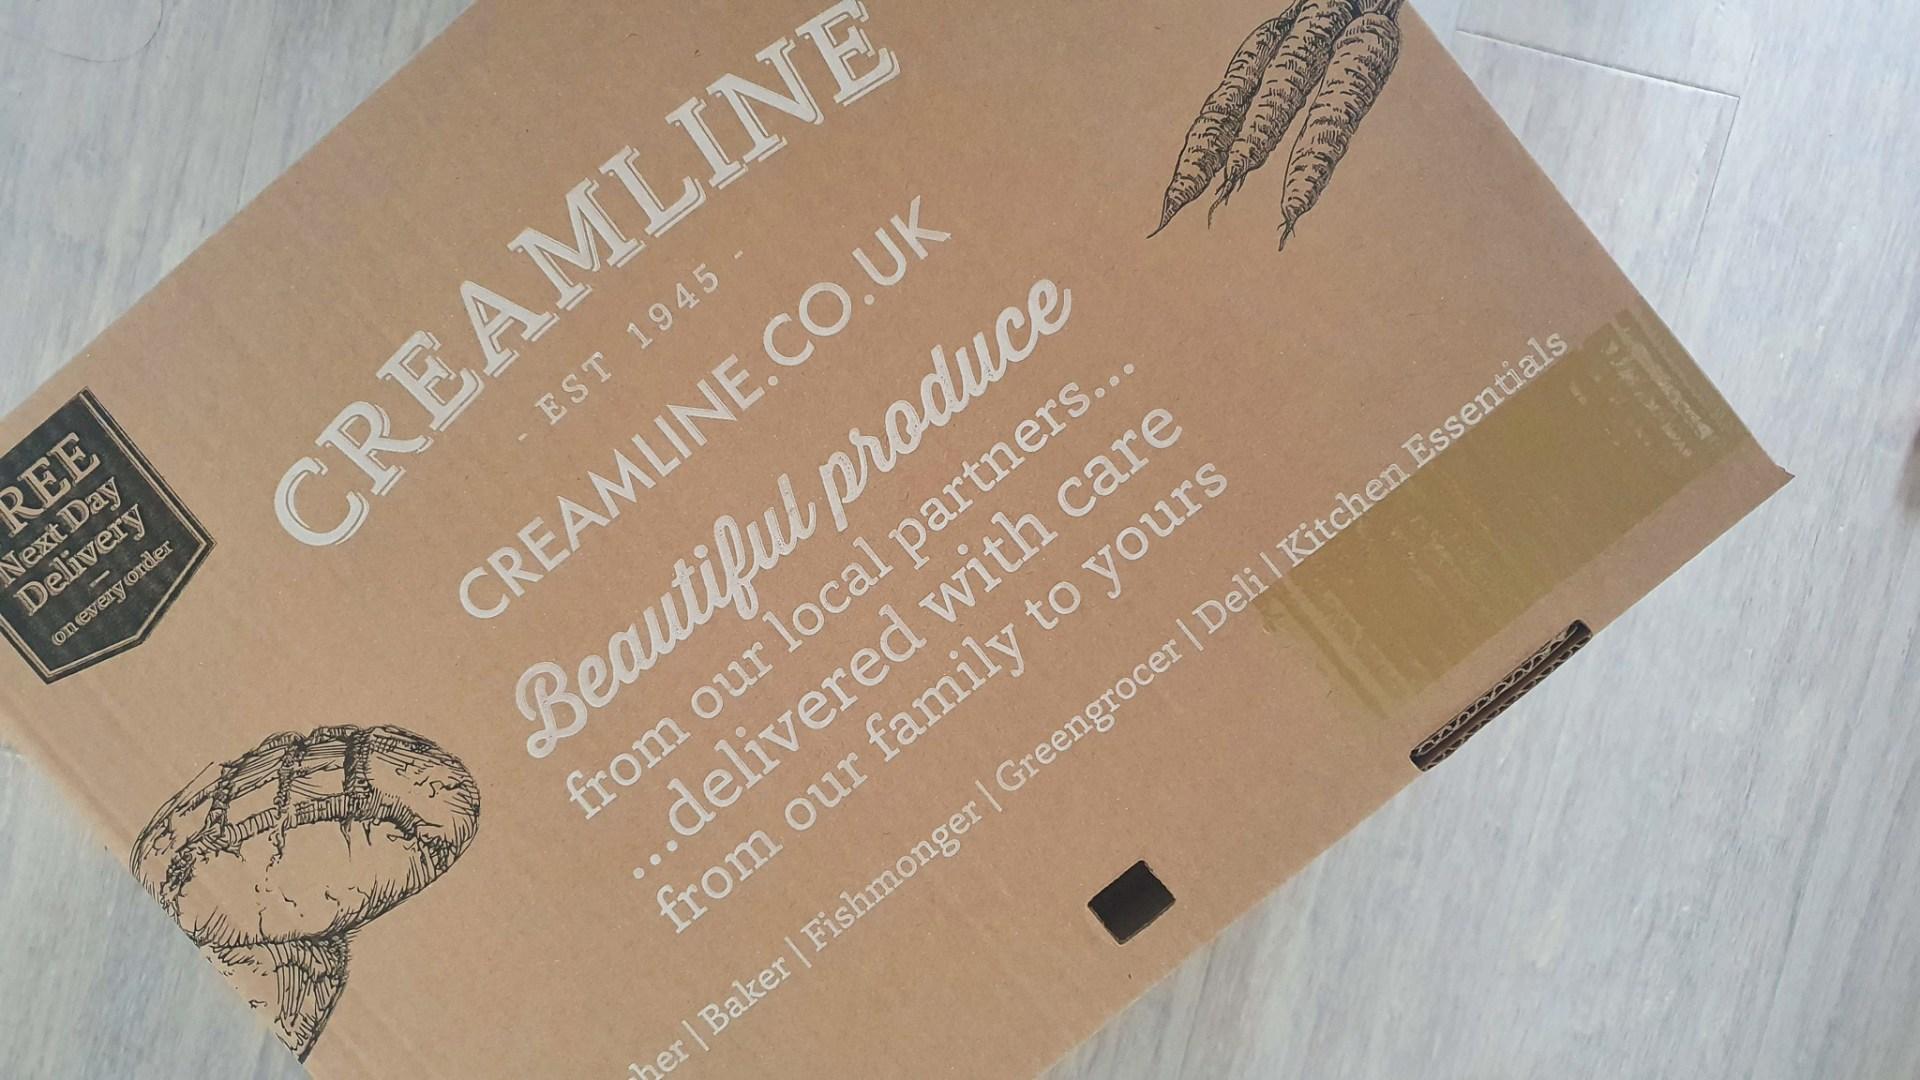 Creamline box